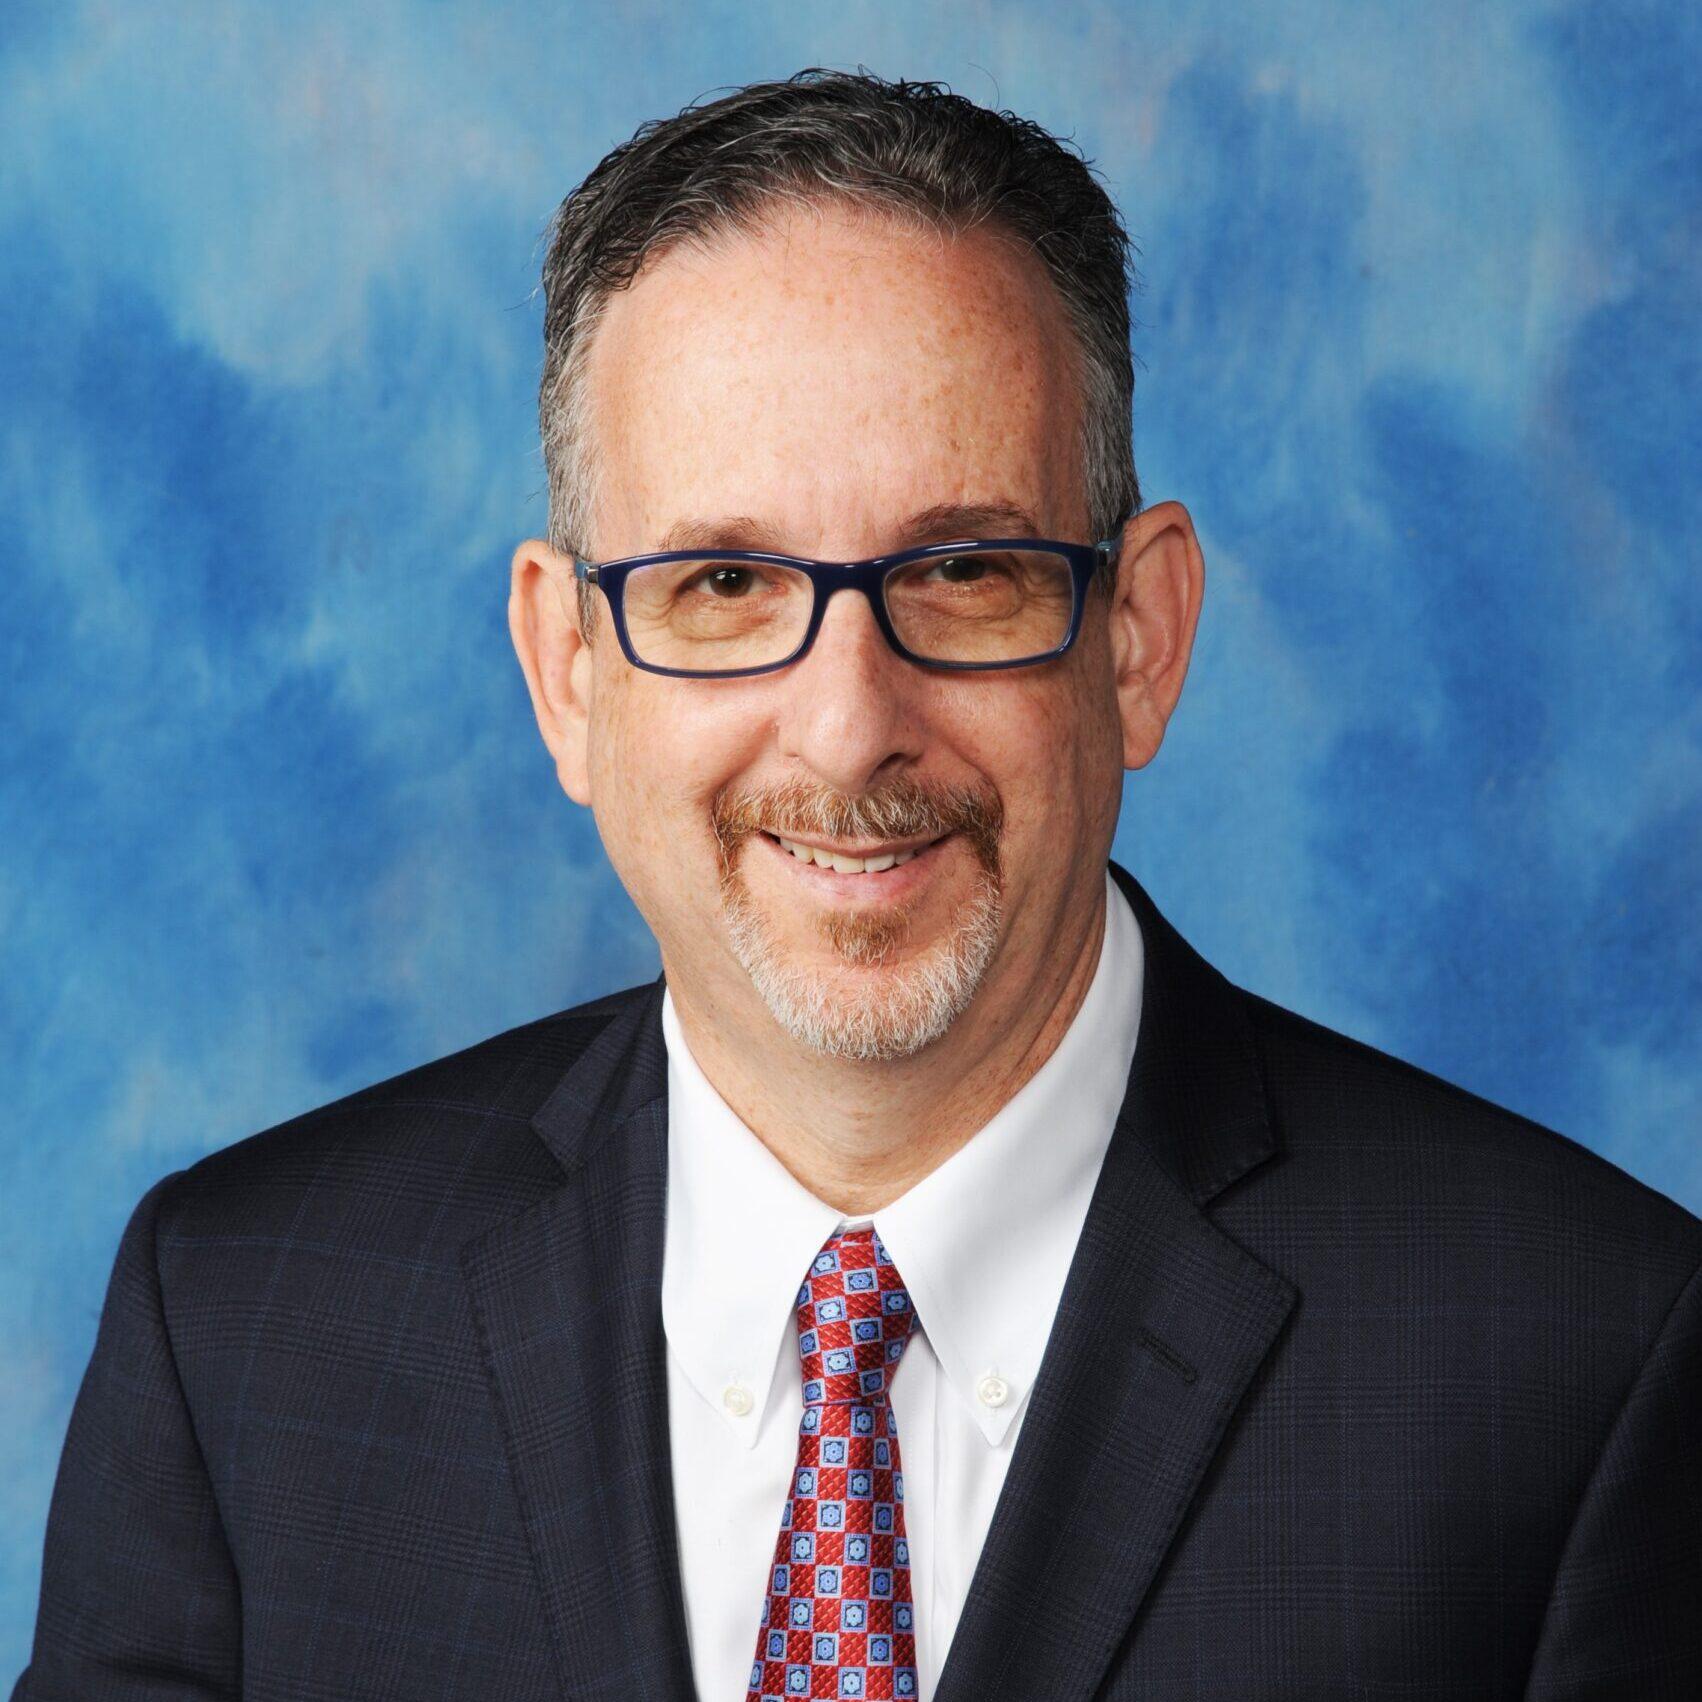 James N. Goldenberg MD, FAAN, CPI, FAPCR